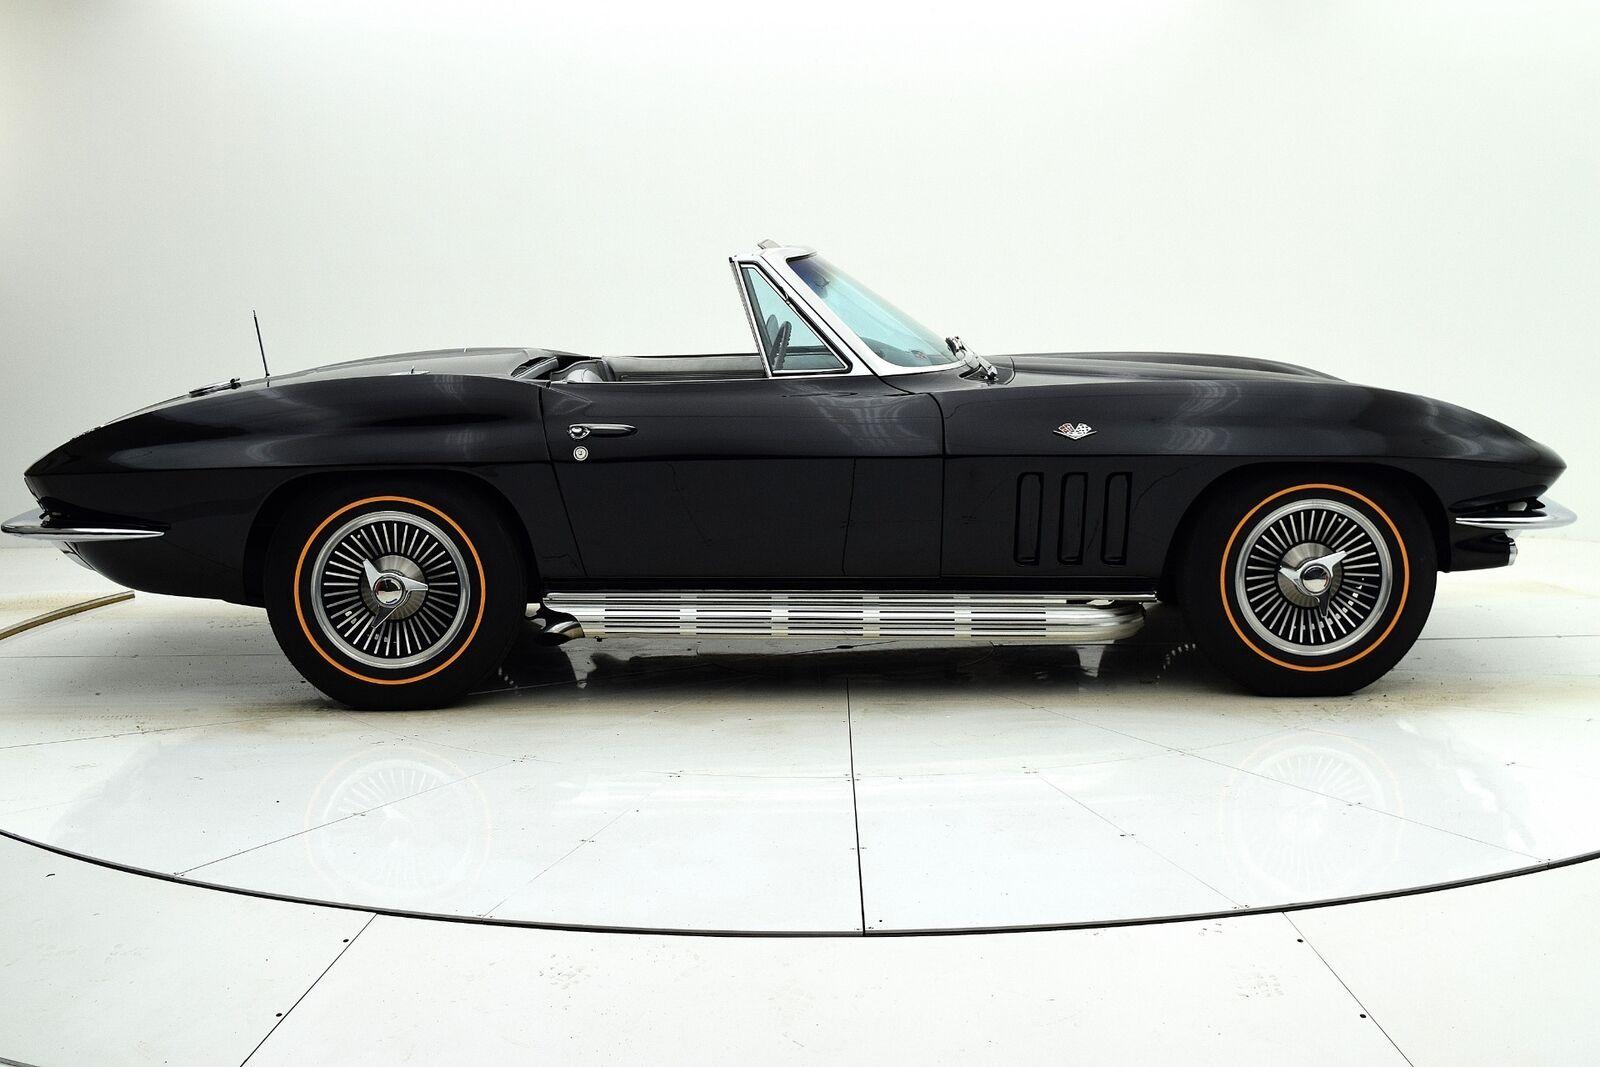 1966 Black Chevrolet Corvette Convertible  | C2 Corvette Photo 7